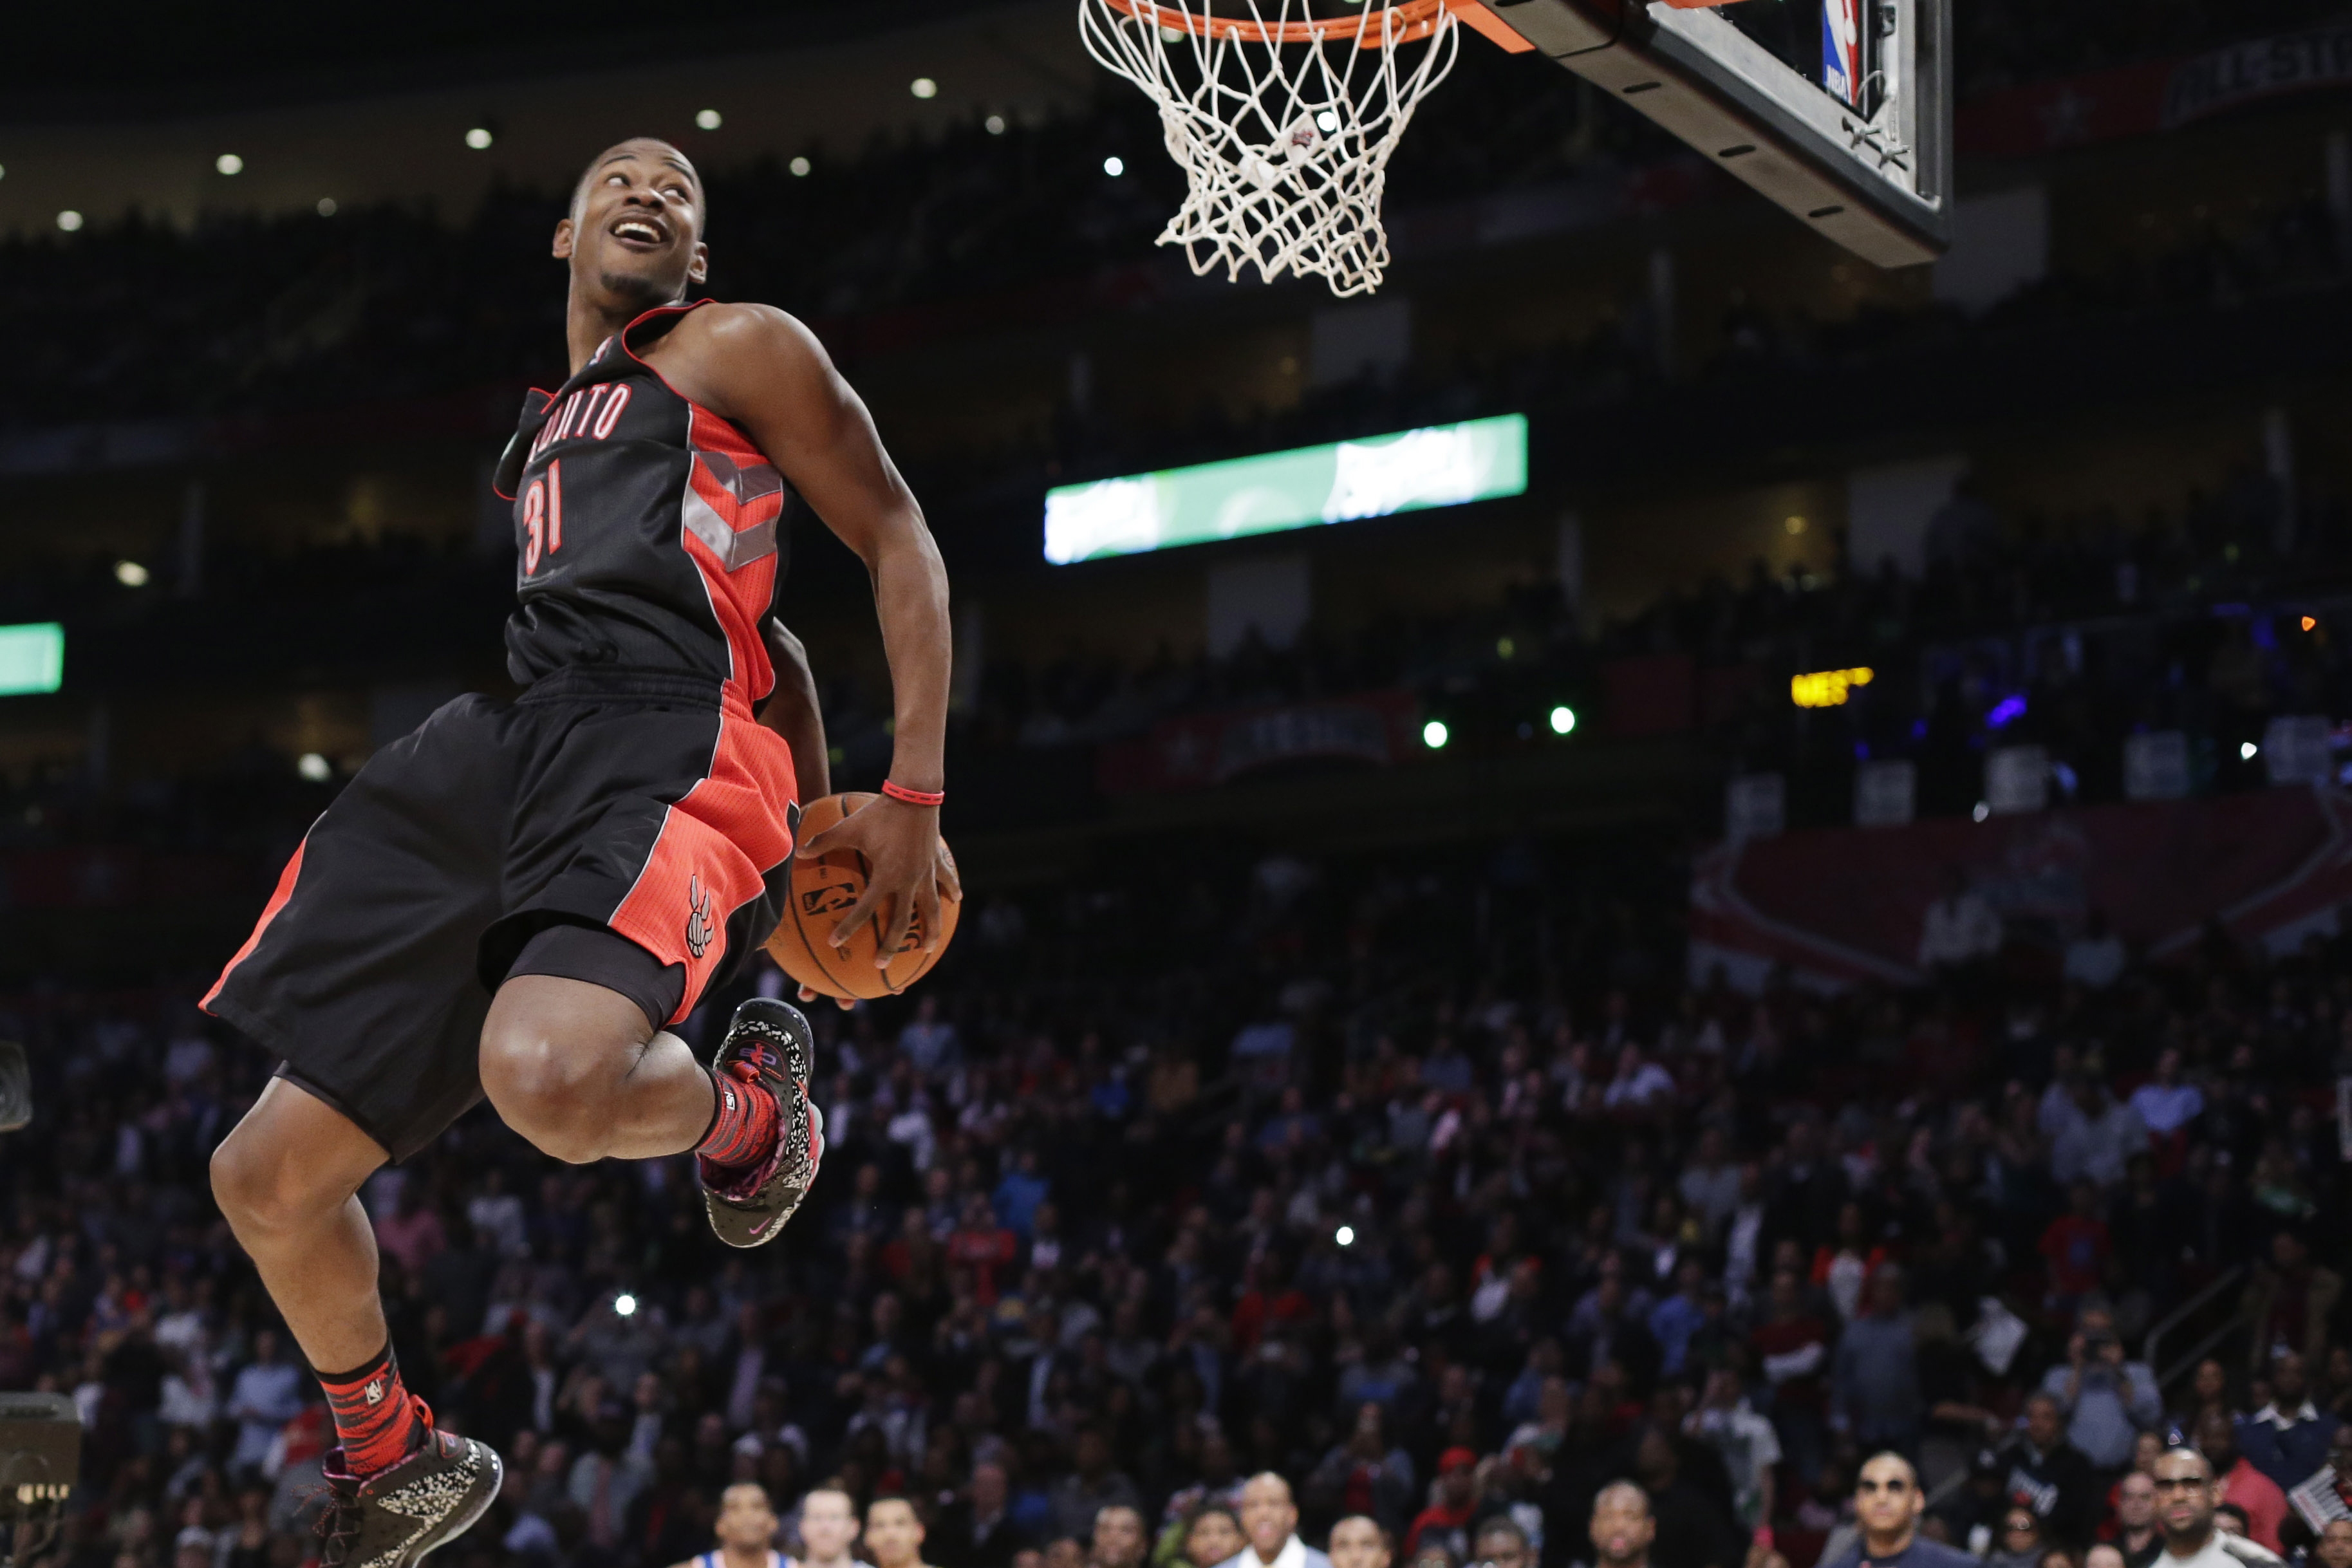 Raptors rookie Terrence Ross wins slam dunk contest - CityNews